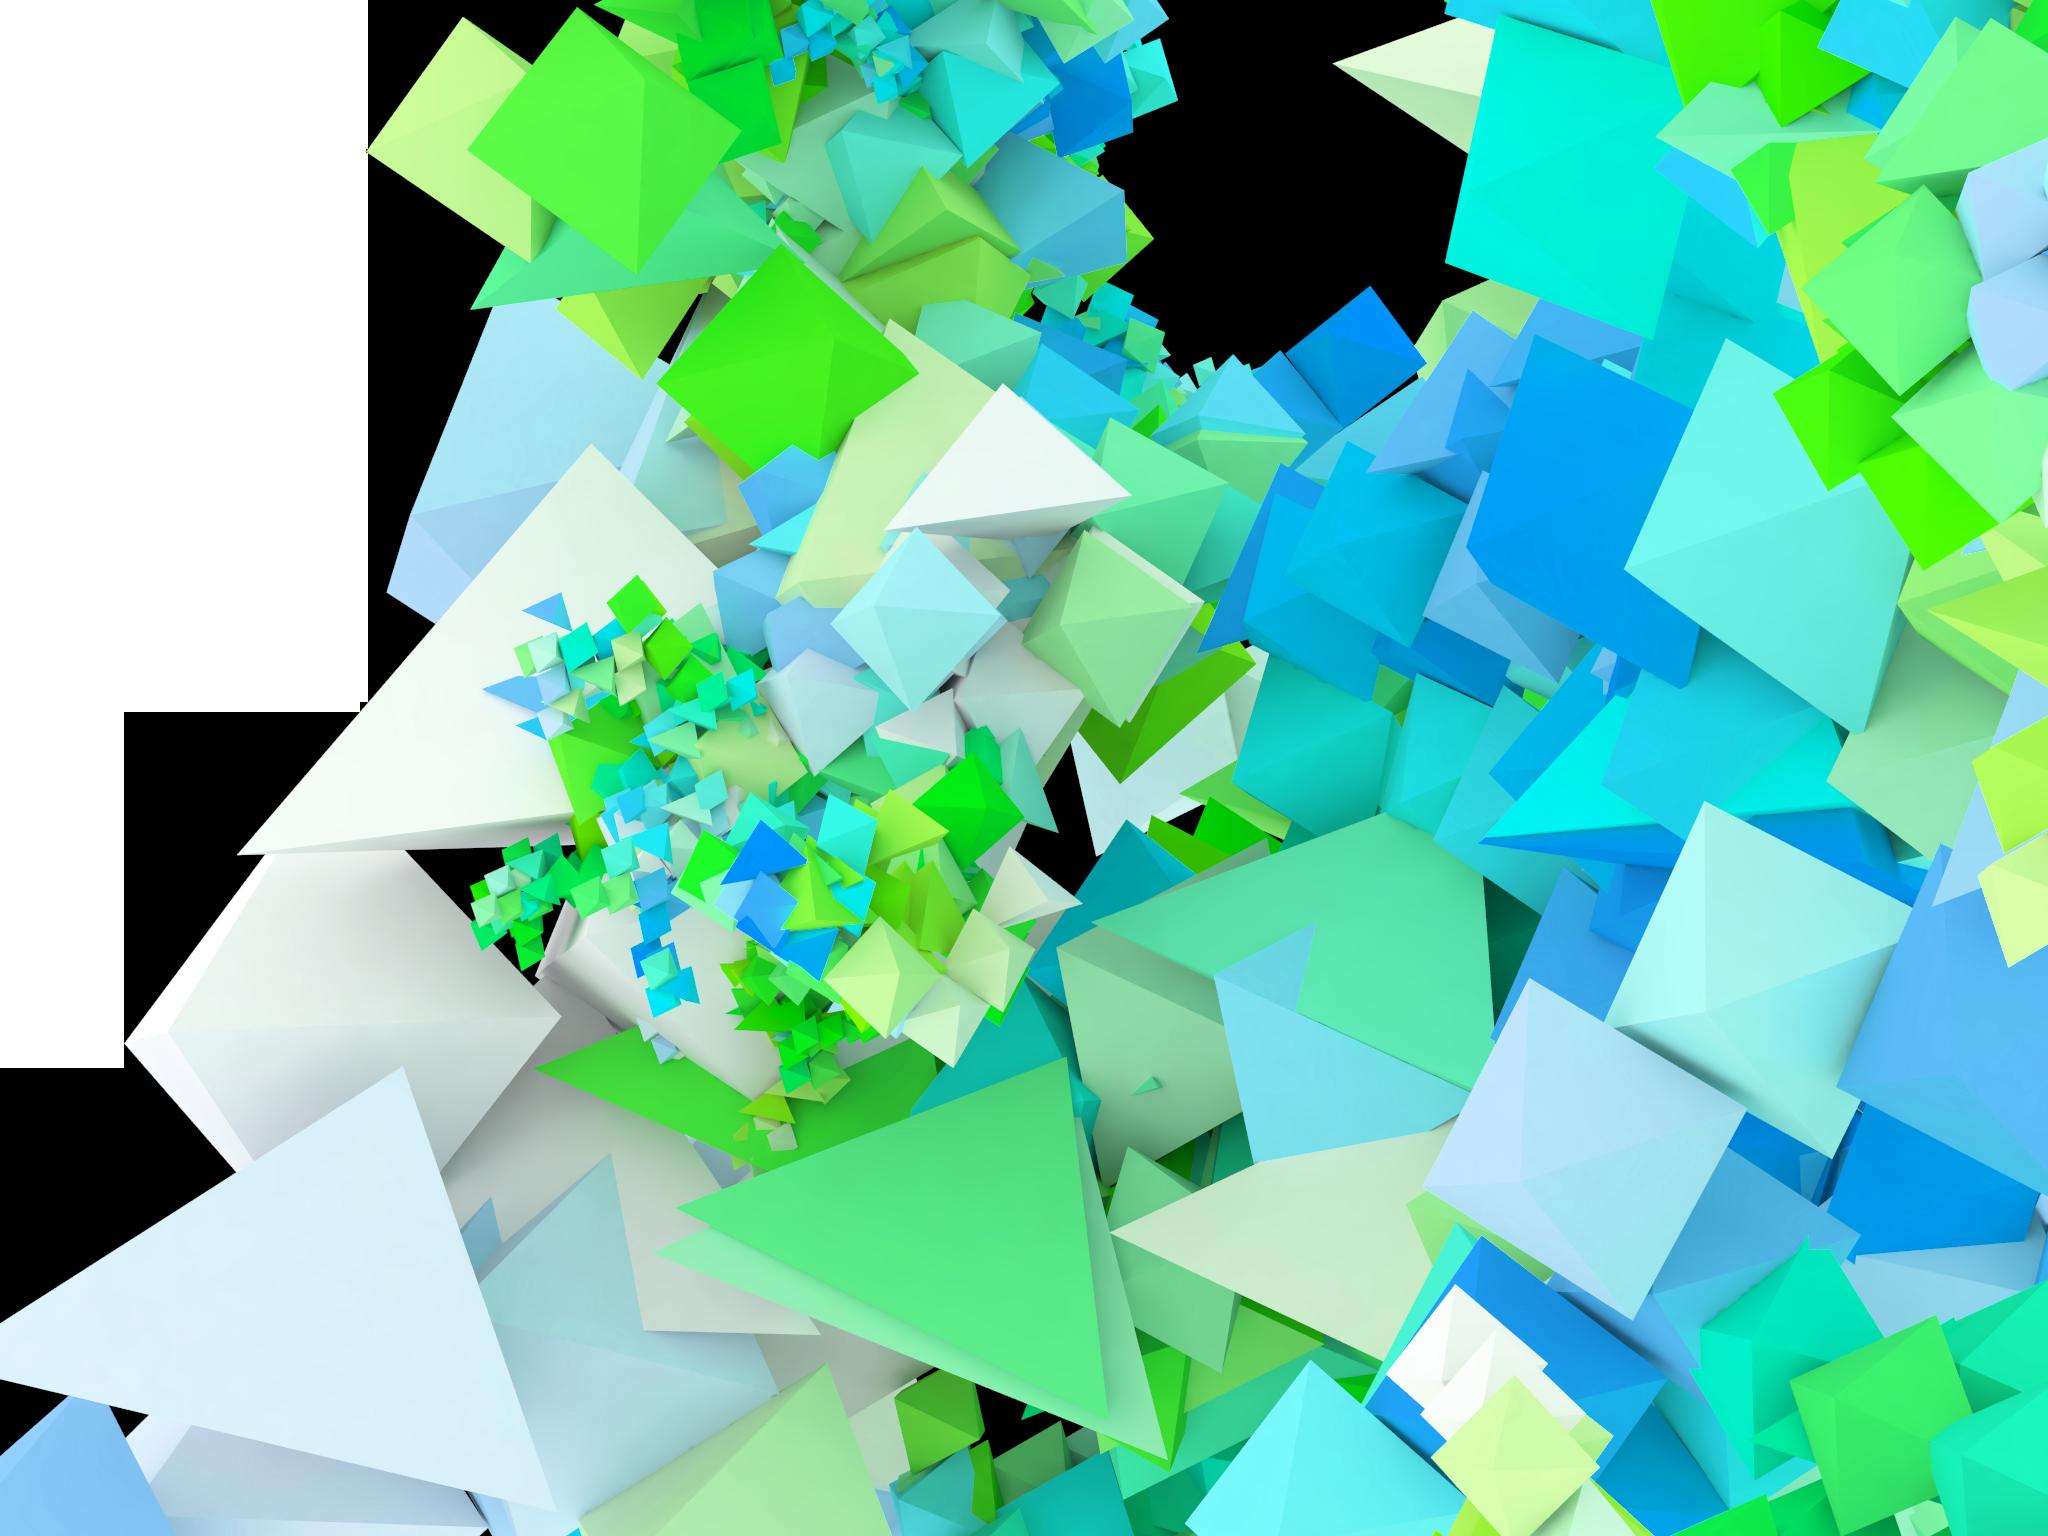 final_render_2a.png